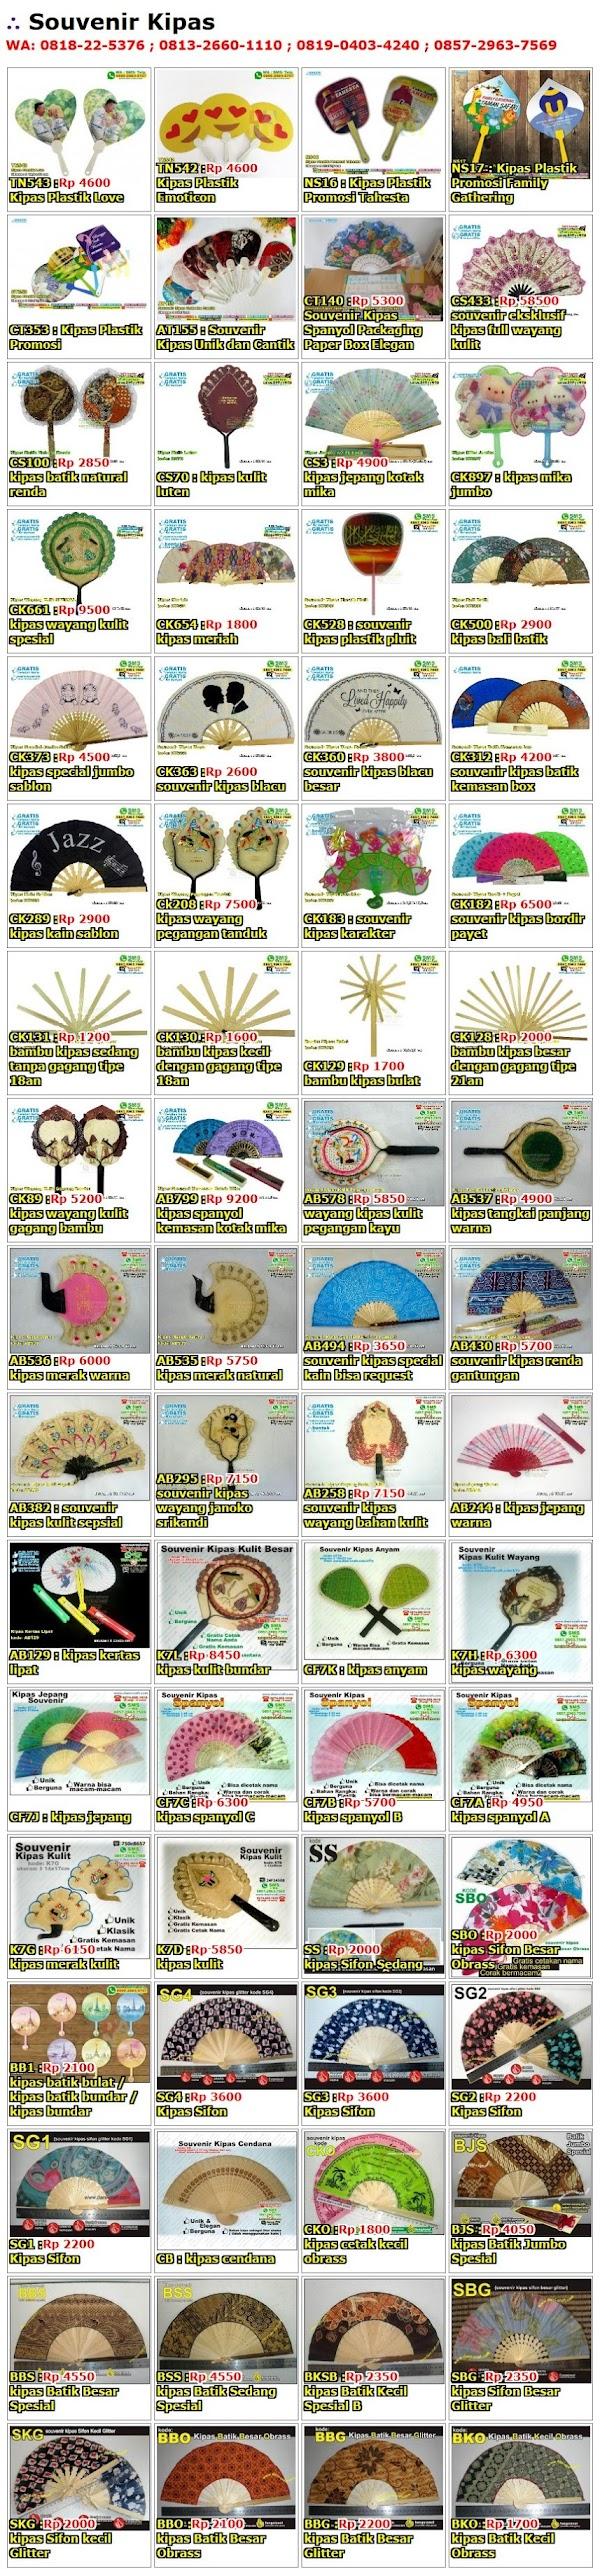 Daftar Harga Souvenir Kipas